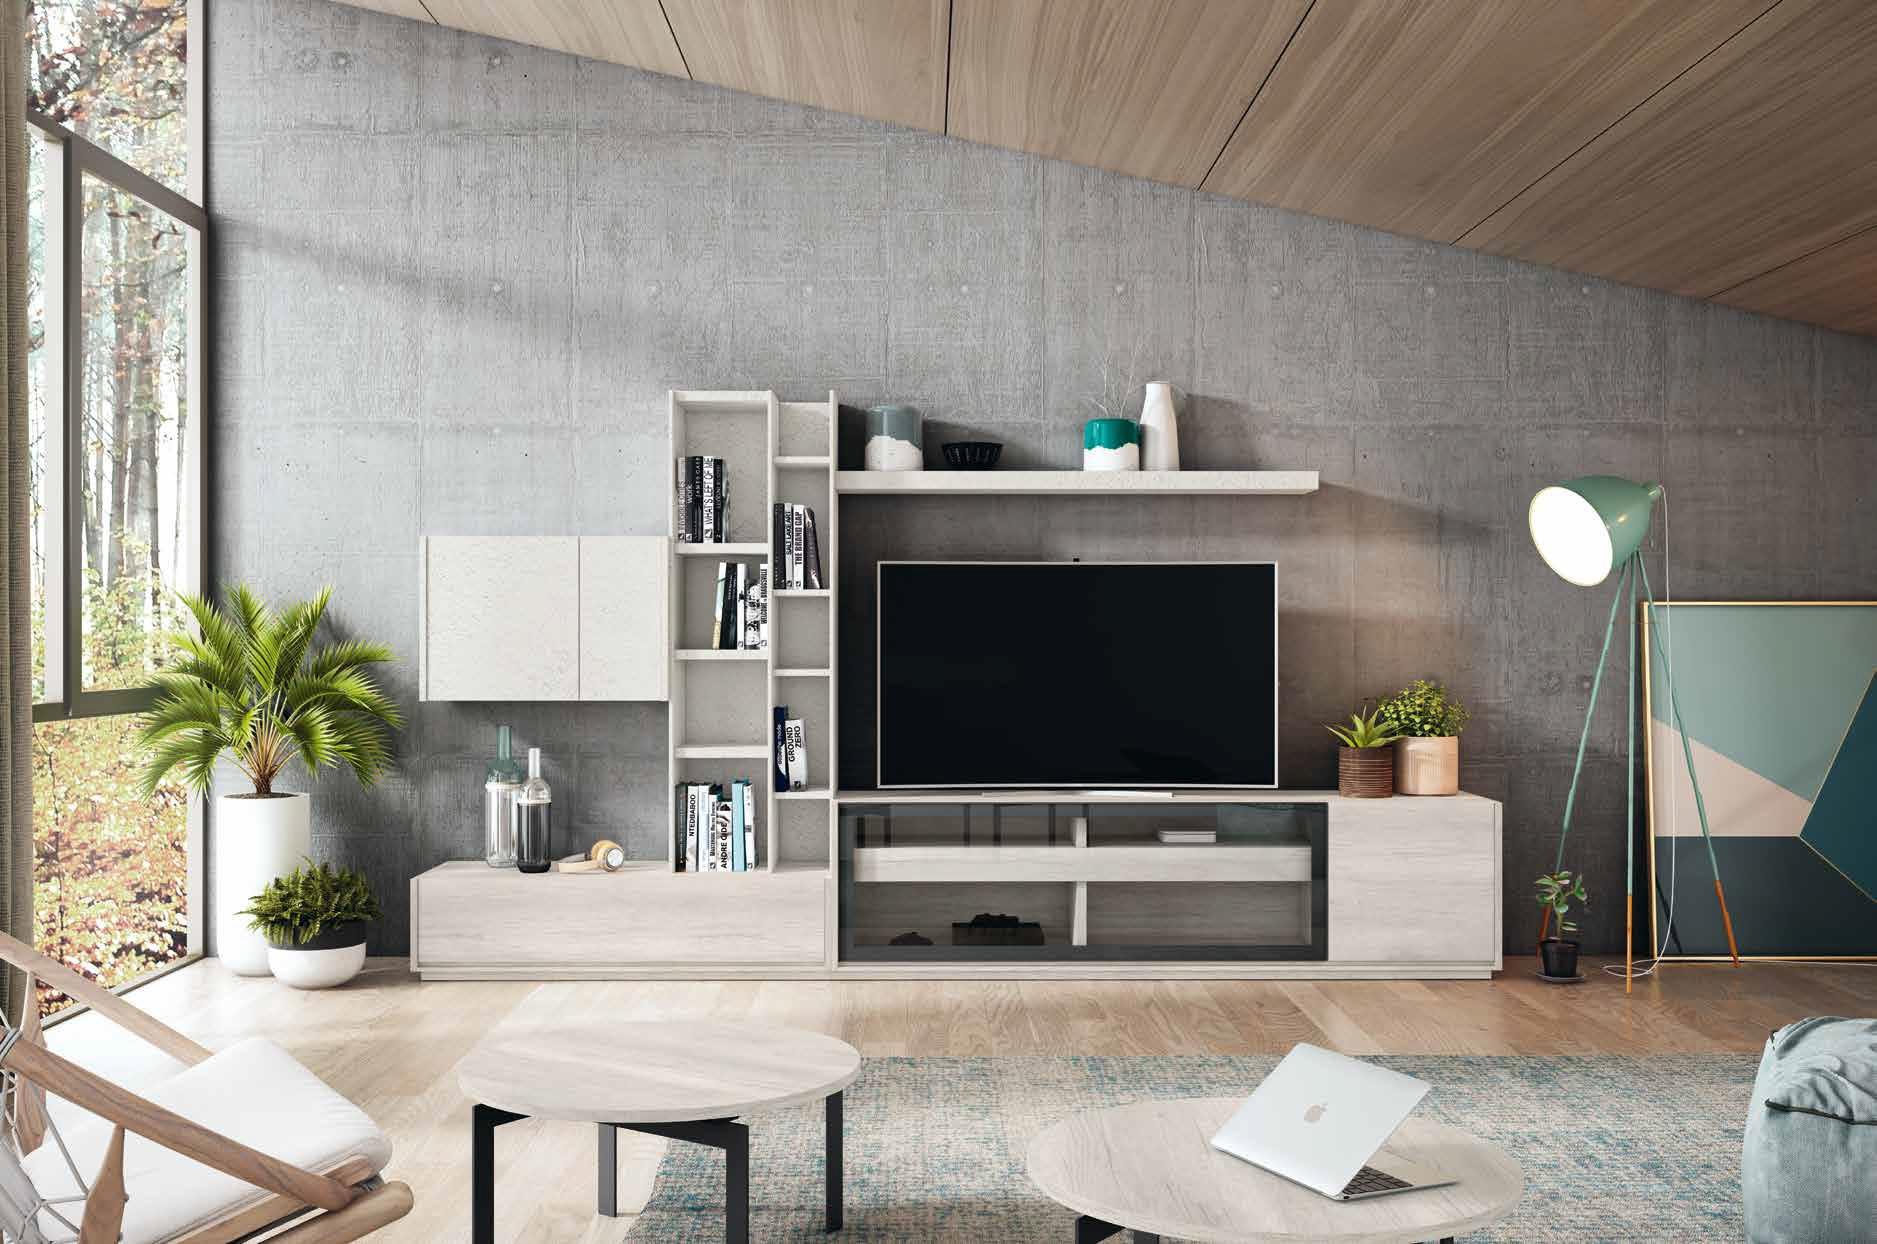 salon-moderno-Nativ-2019-muebles-paco-caballero-0920-5c8ceababd213